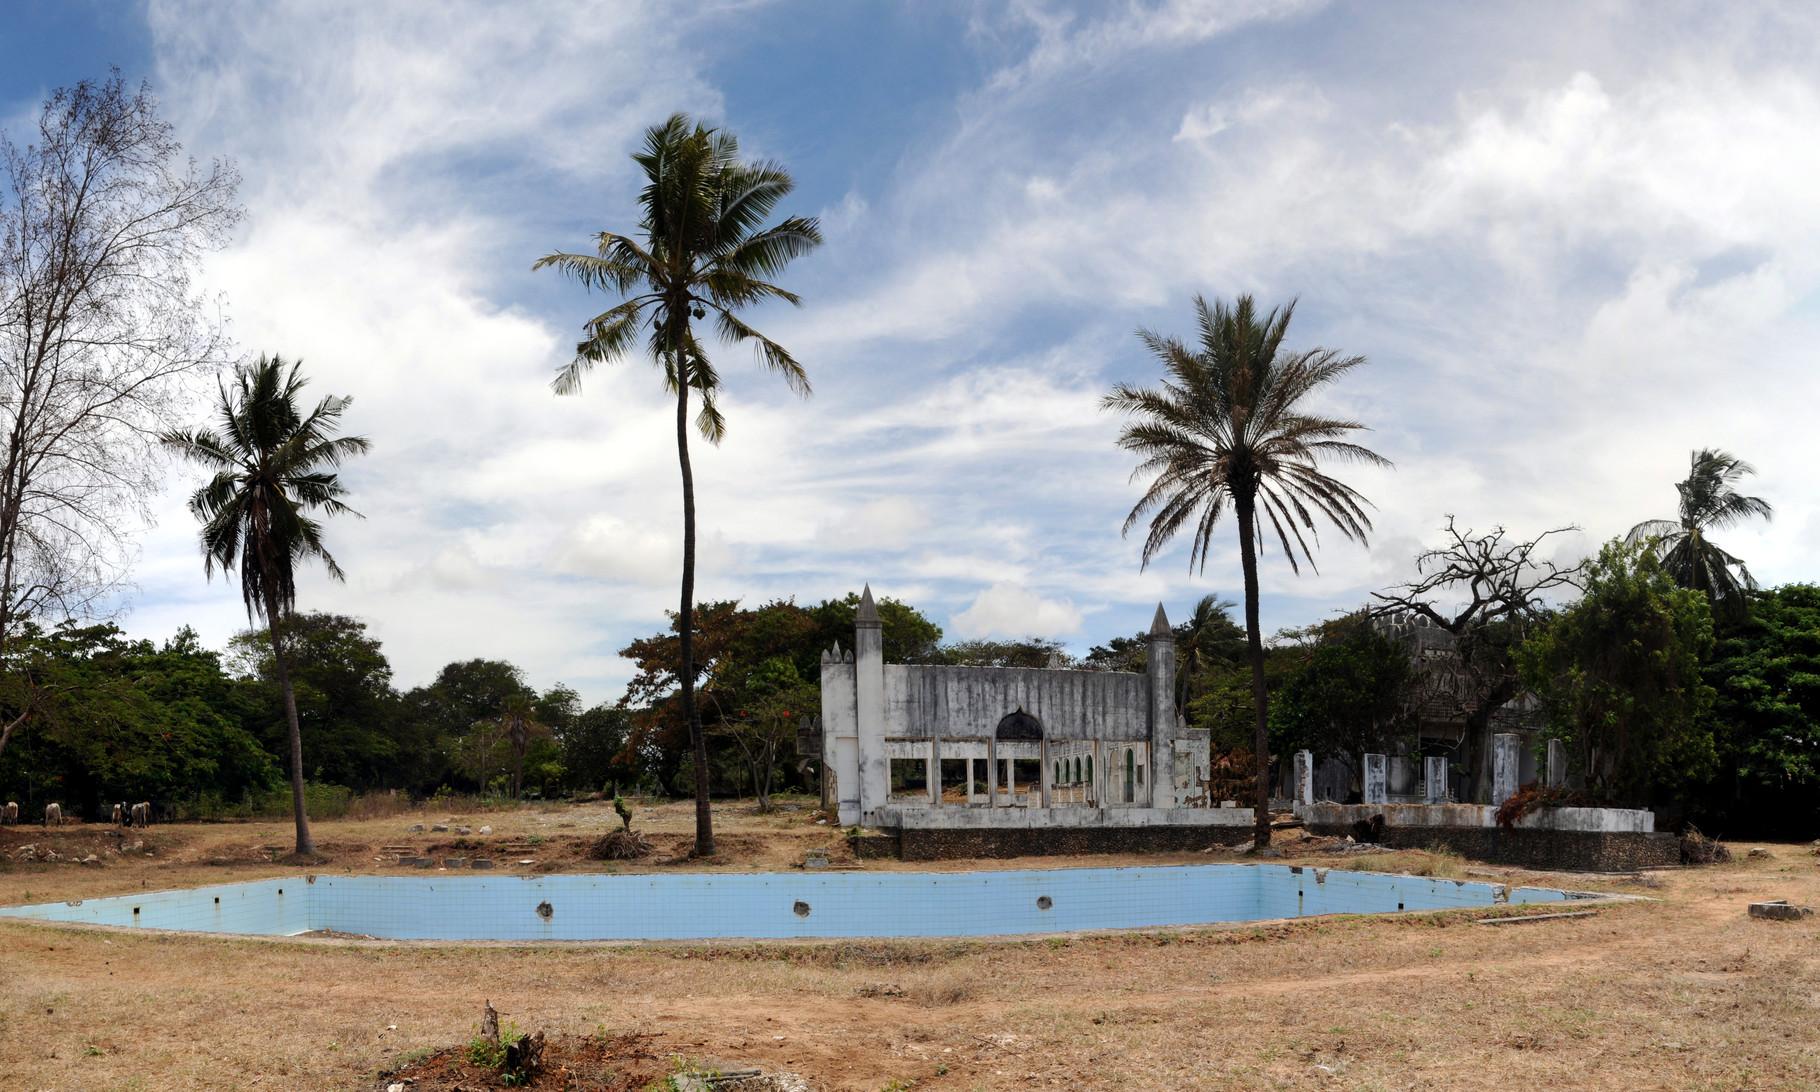 Sindbad Hotel - Malindi 2010